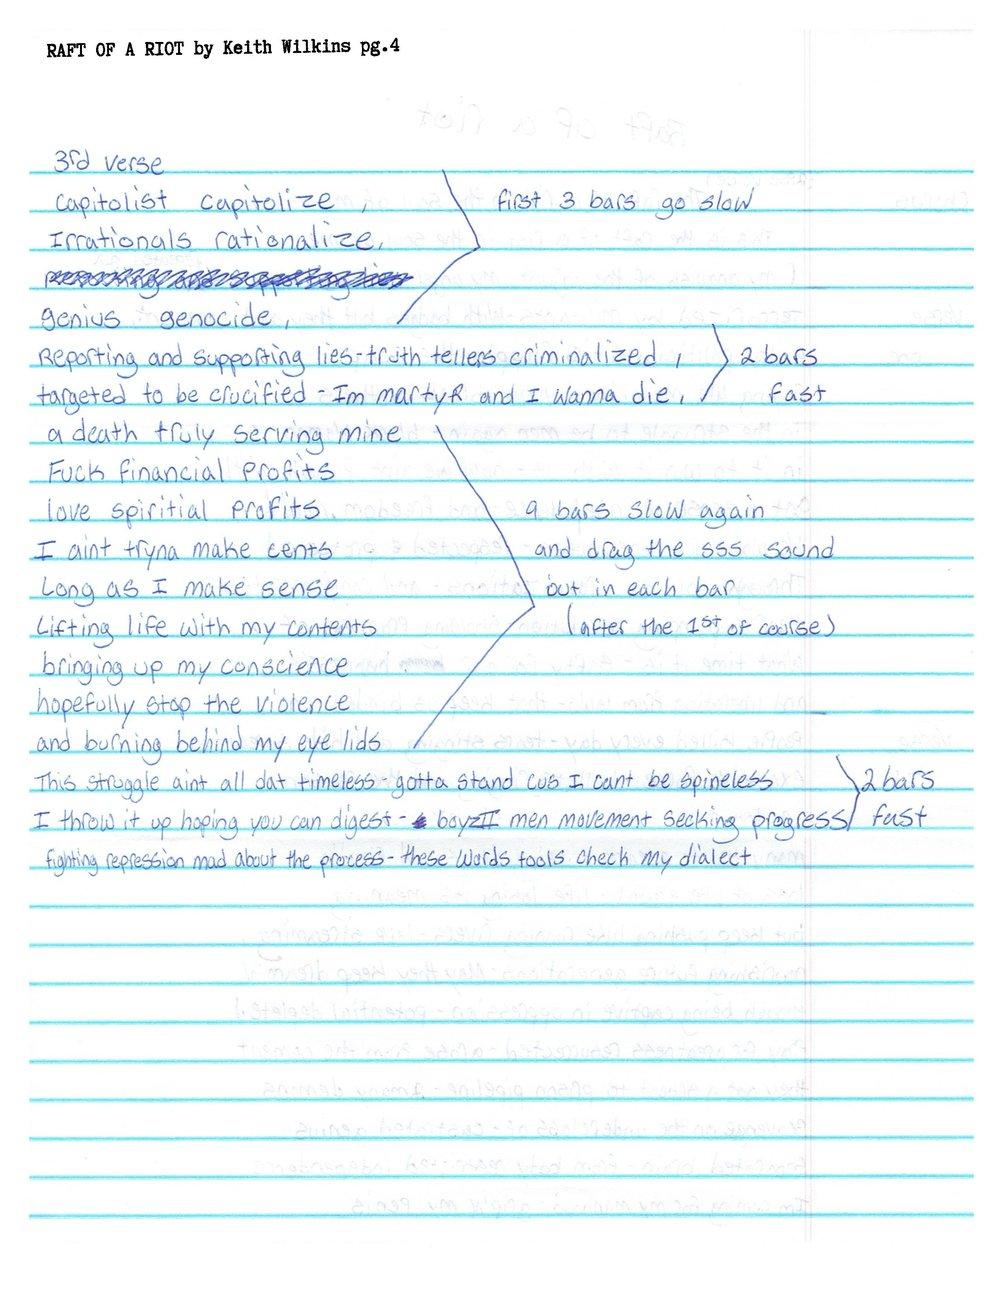 SLFH_vol_1-page-010.jpg